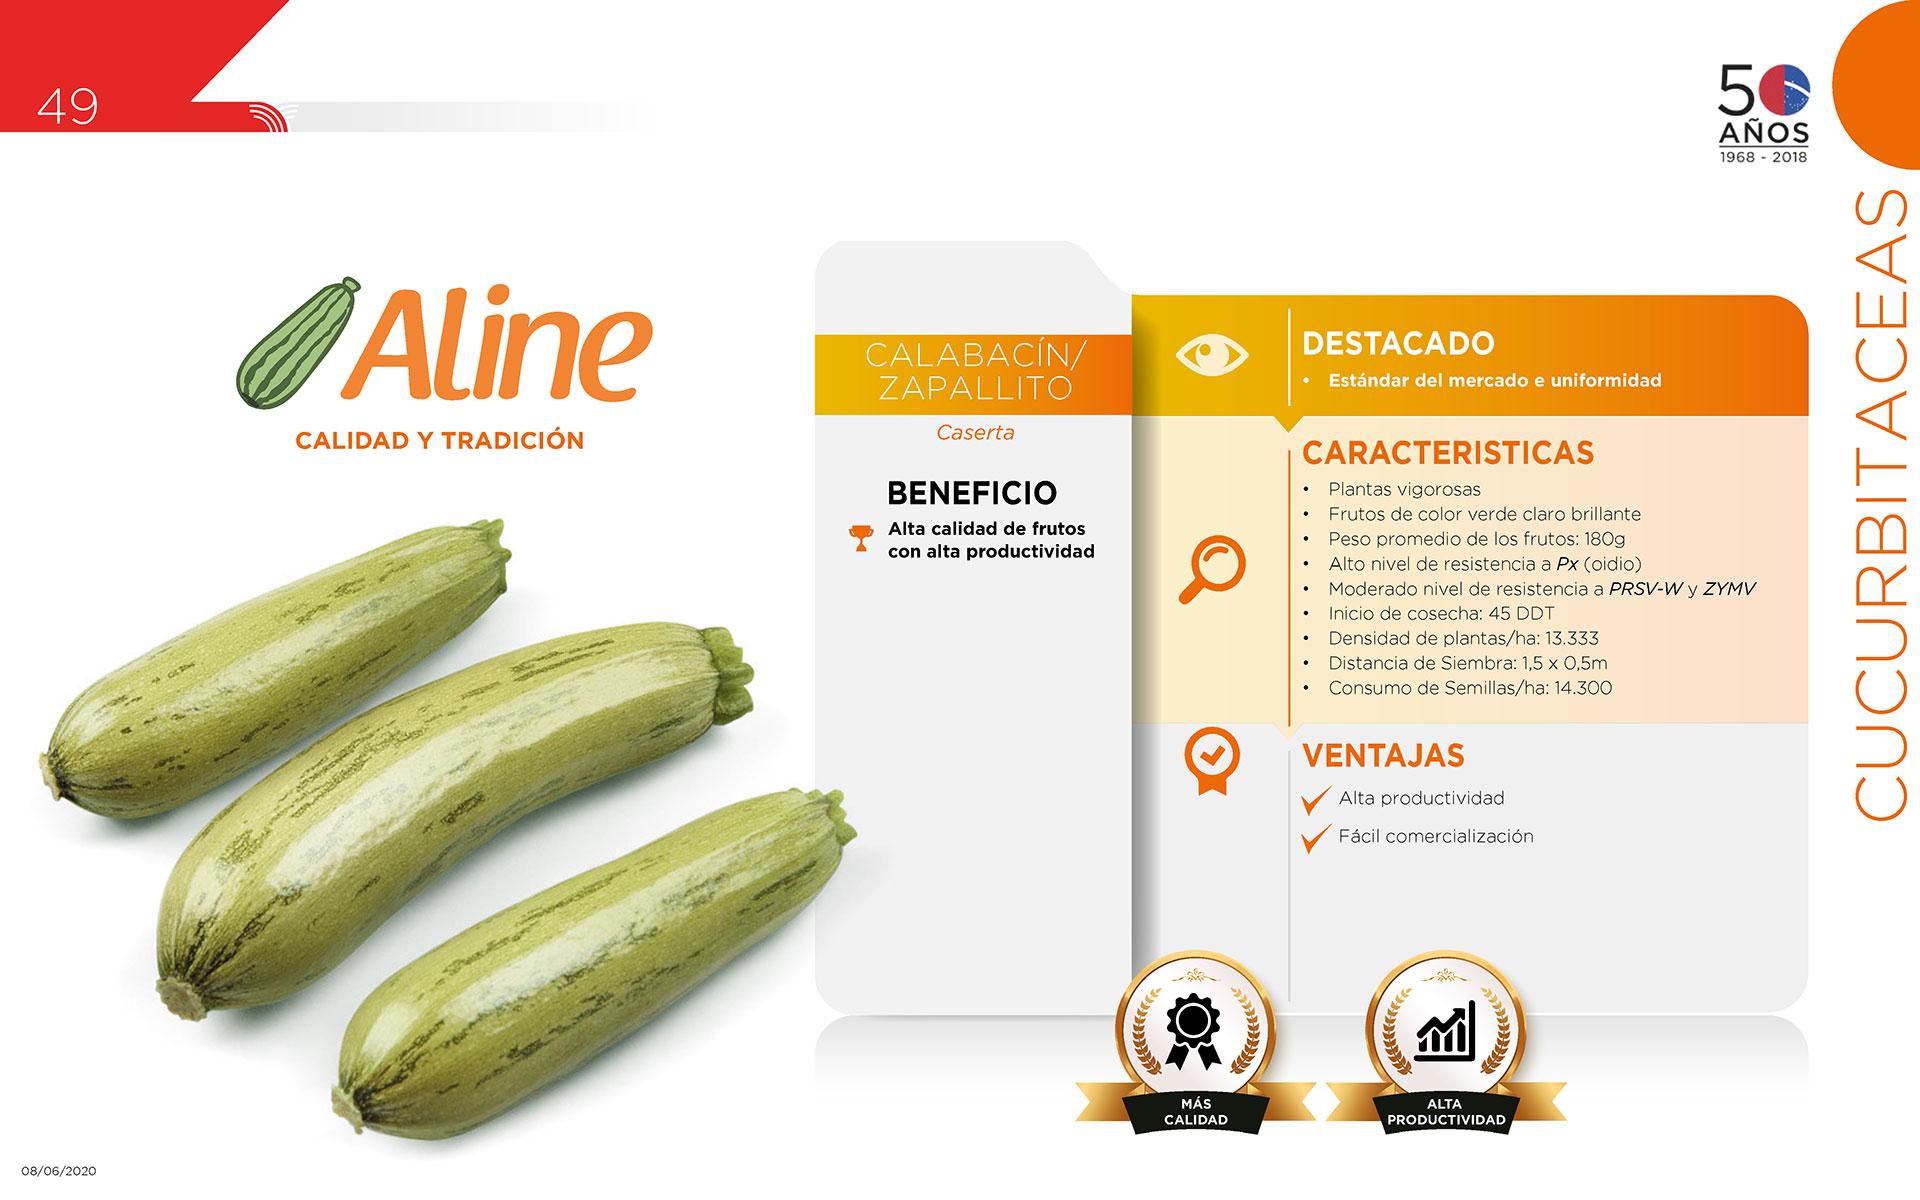 Aline - Cucurbitaceas